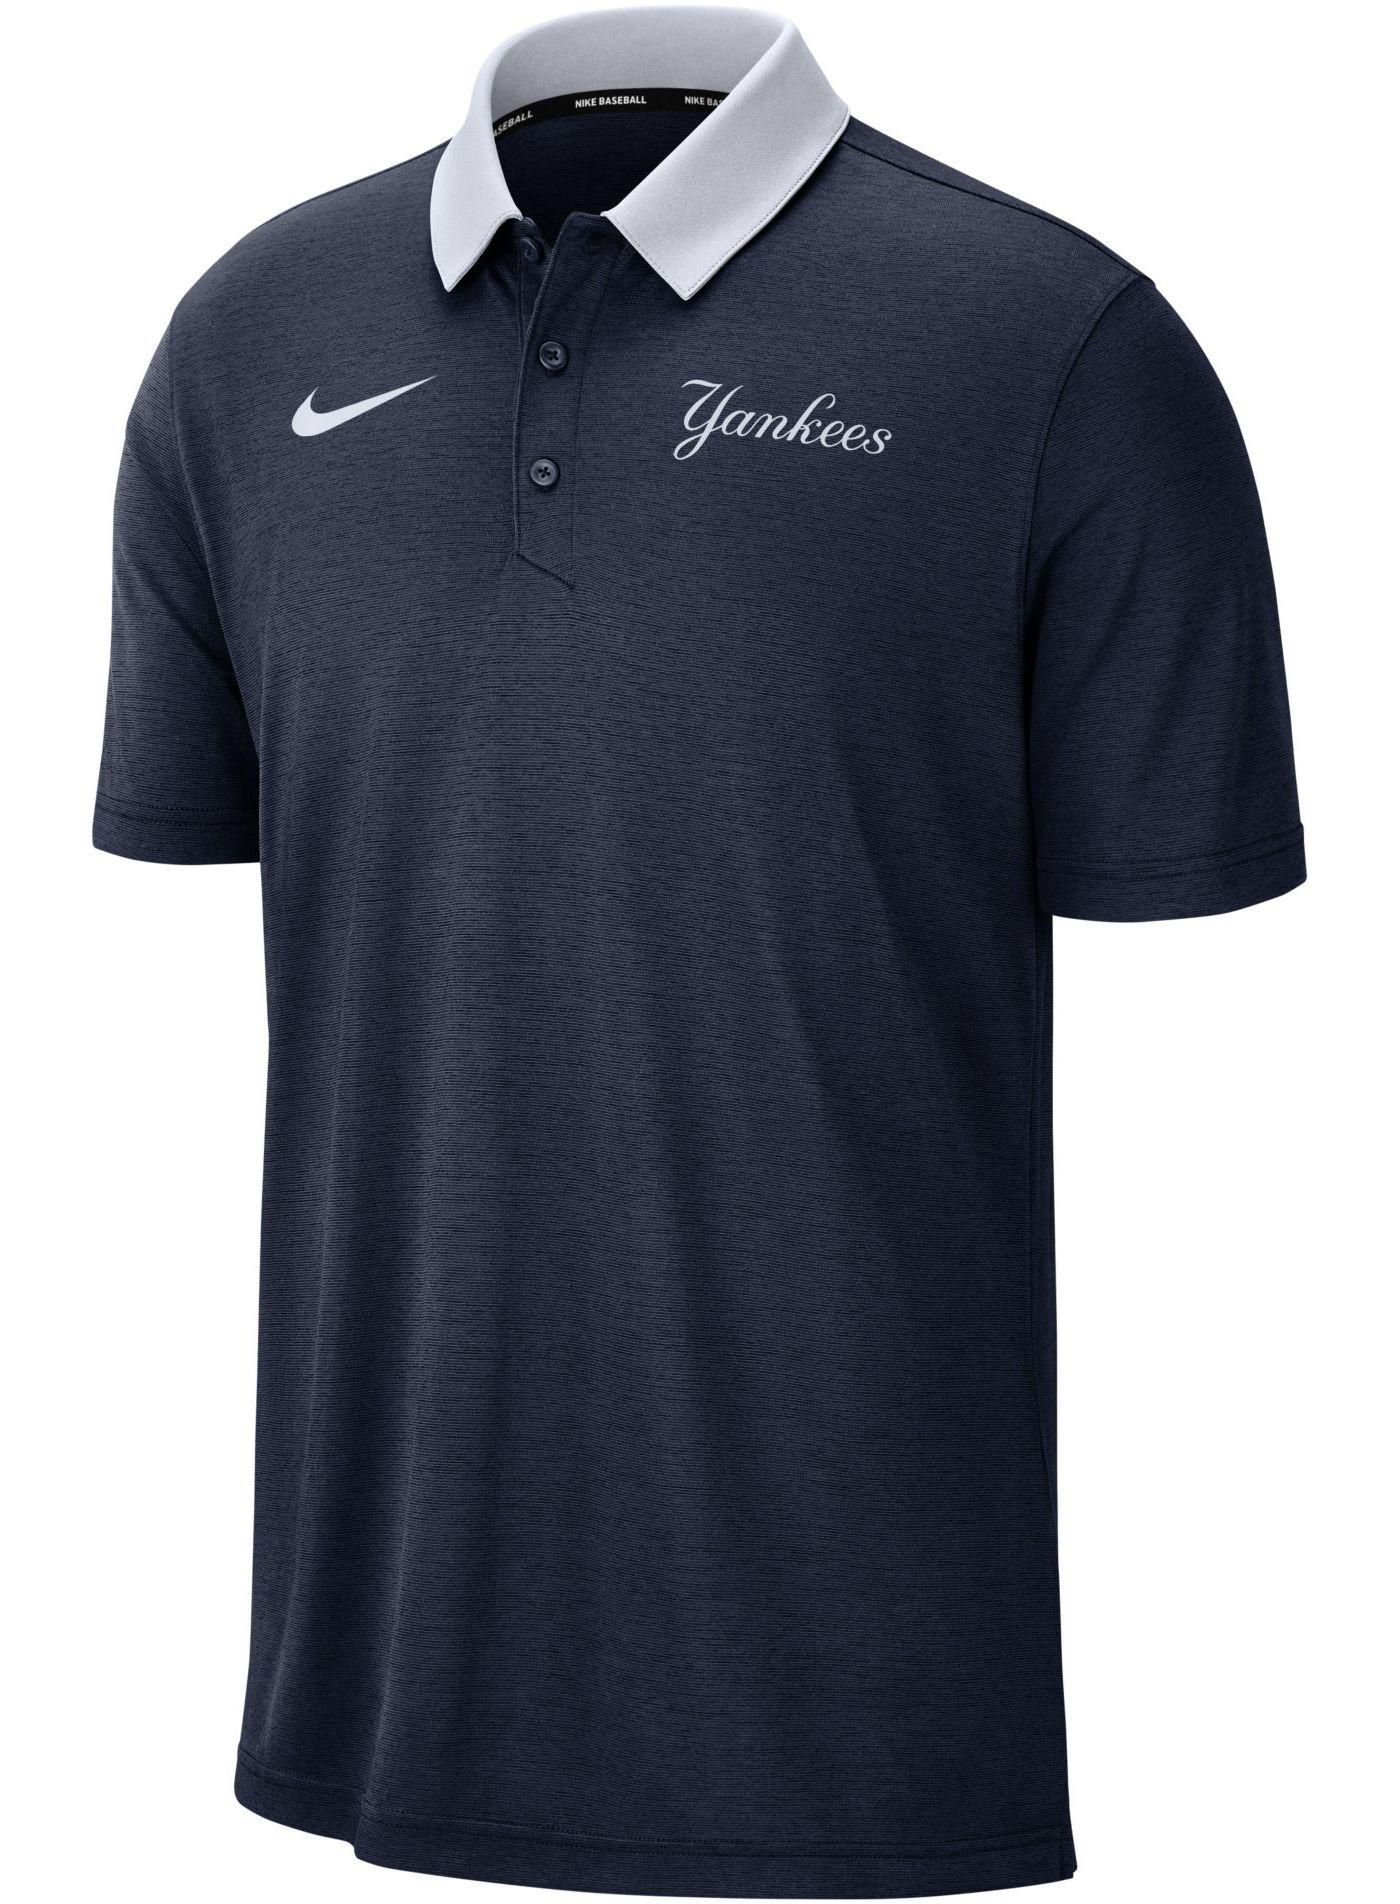 Nike Men's New York Yankees Breathe Polo